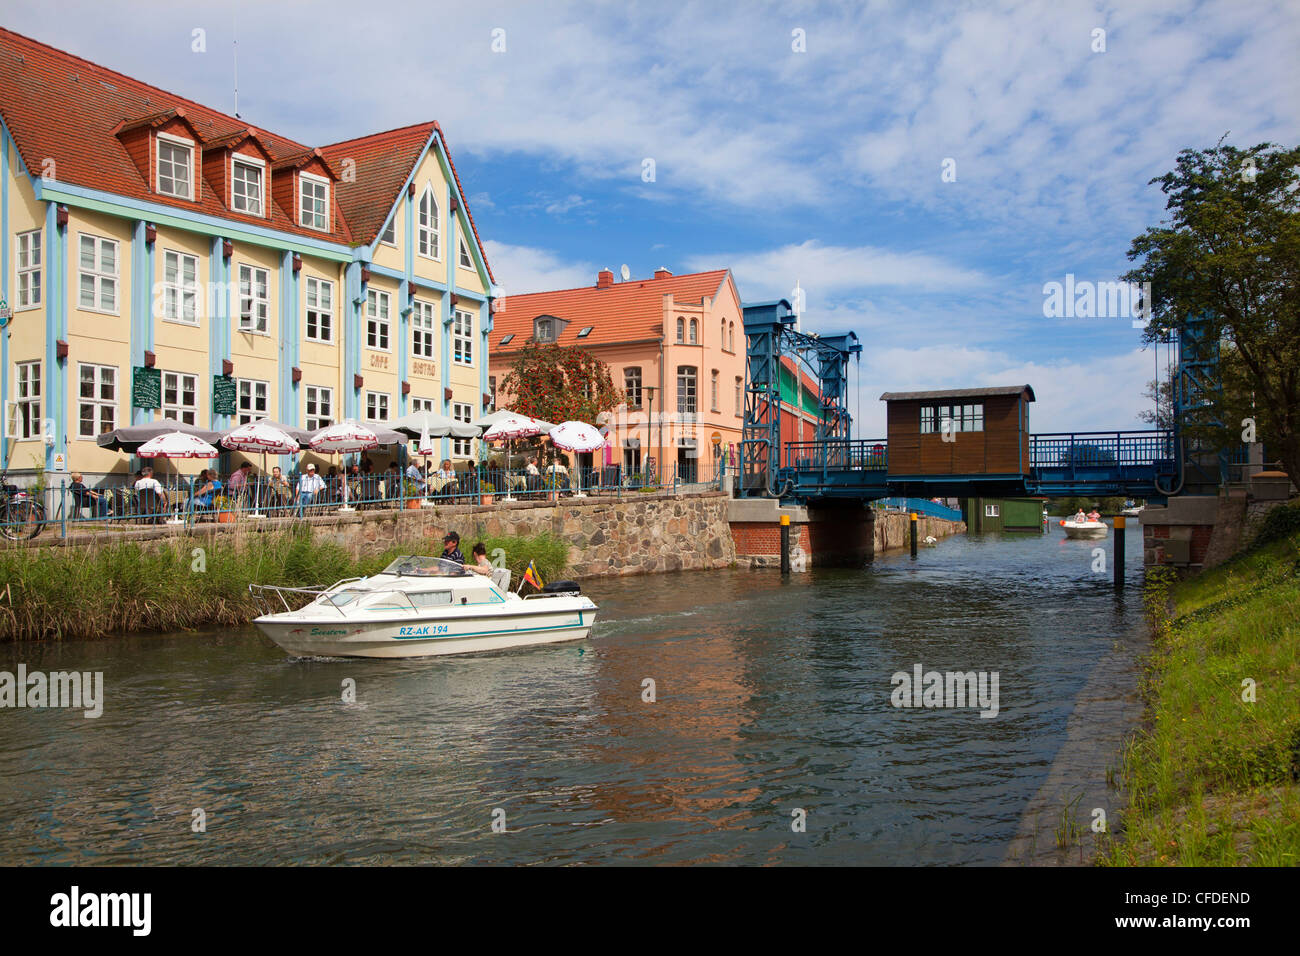 Motorboat at the lift bridge, Plau, Plau lake, Mueritz-Elde-canal, Mecklenburg lake district, Mecklenburg Western - Stock Image